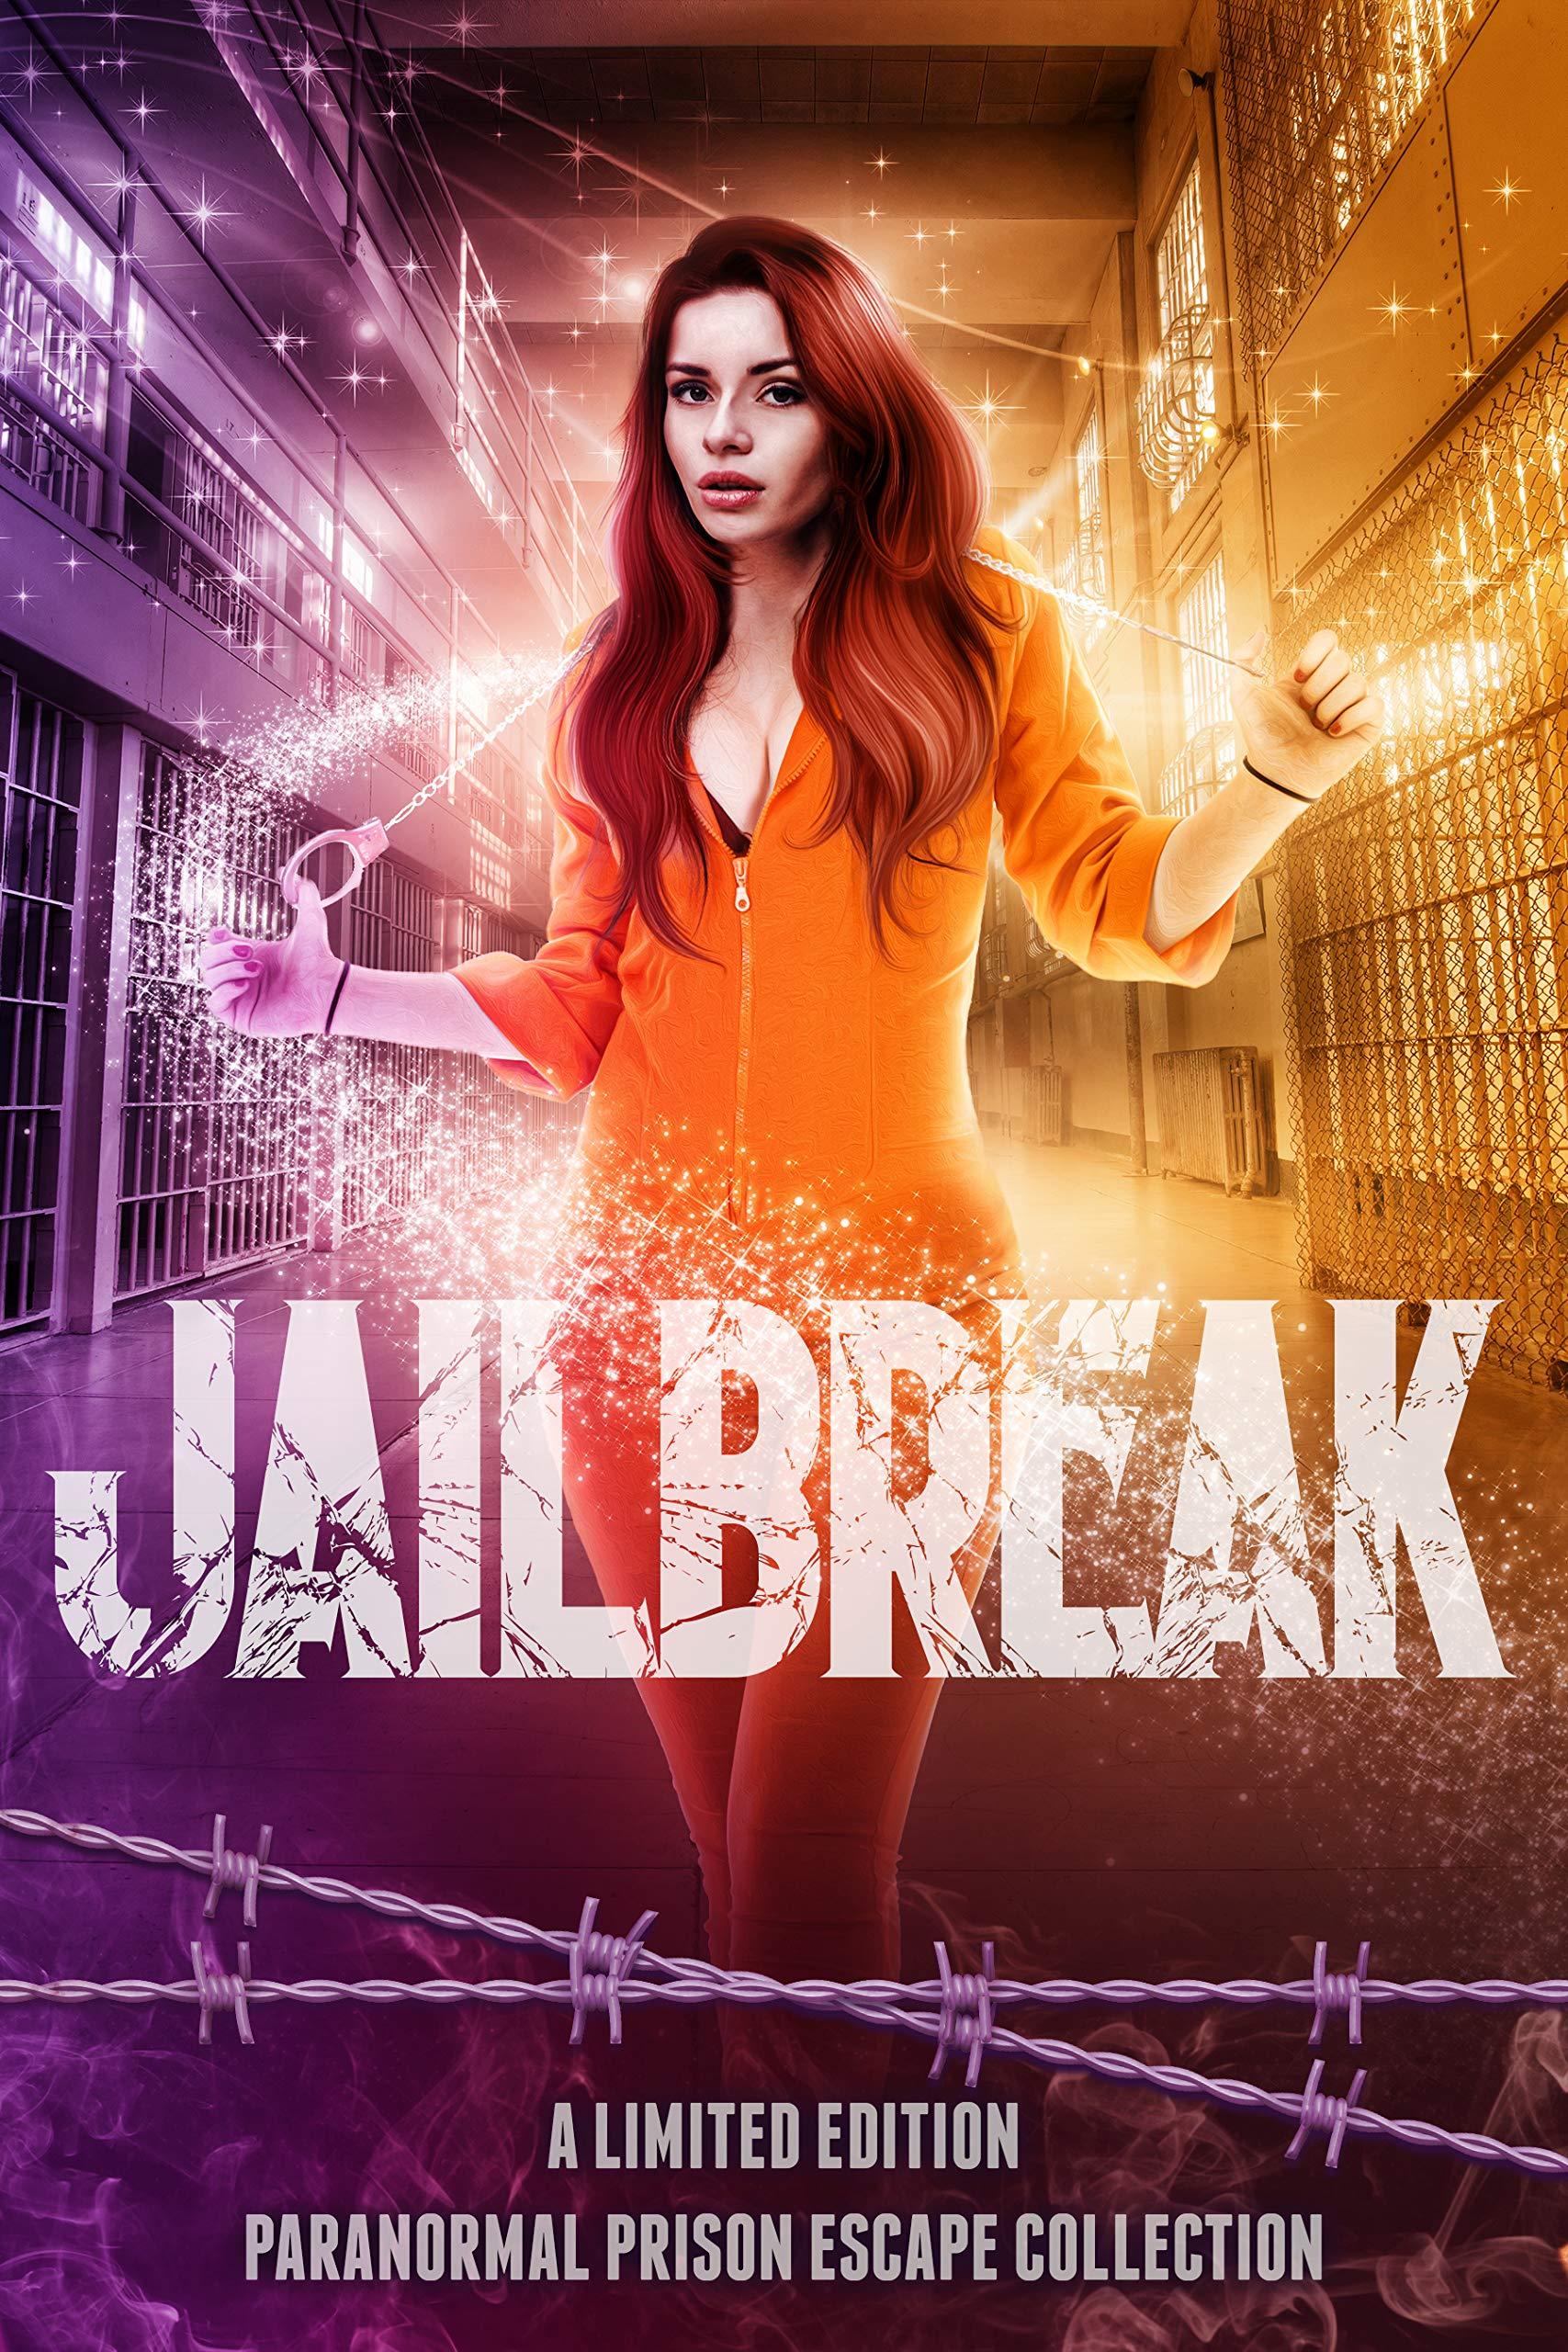 Jailbreak: A Limited Edition Paranormal Prison Escape Collection